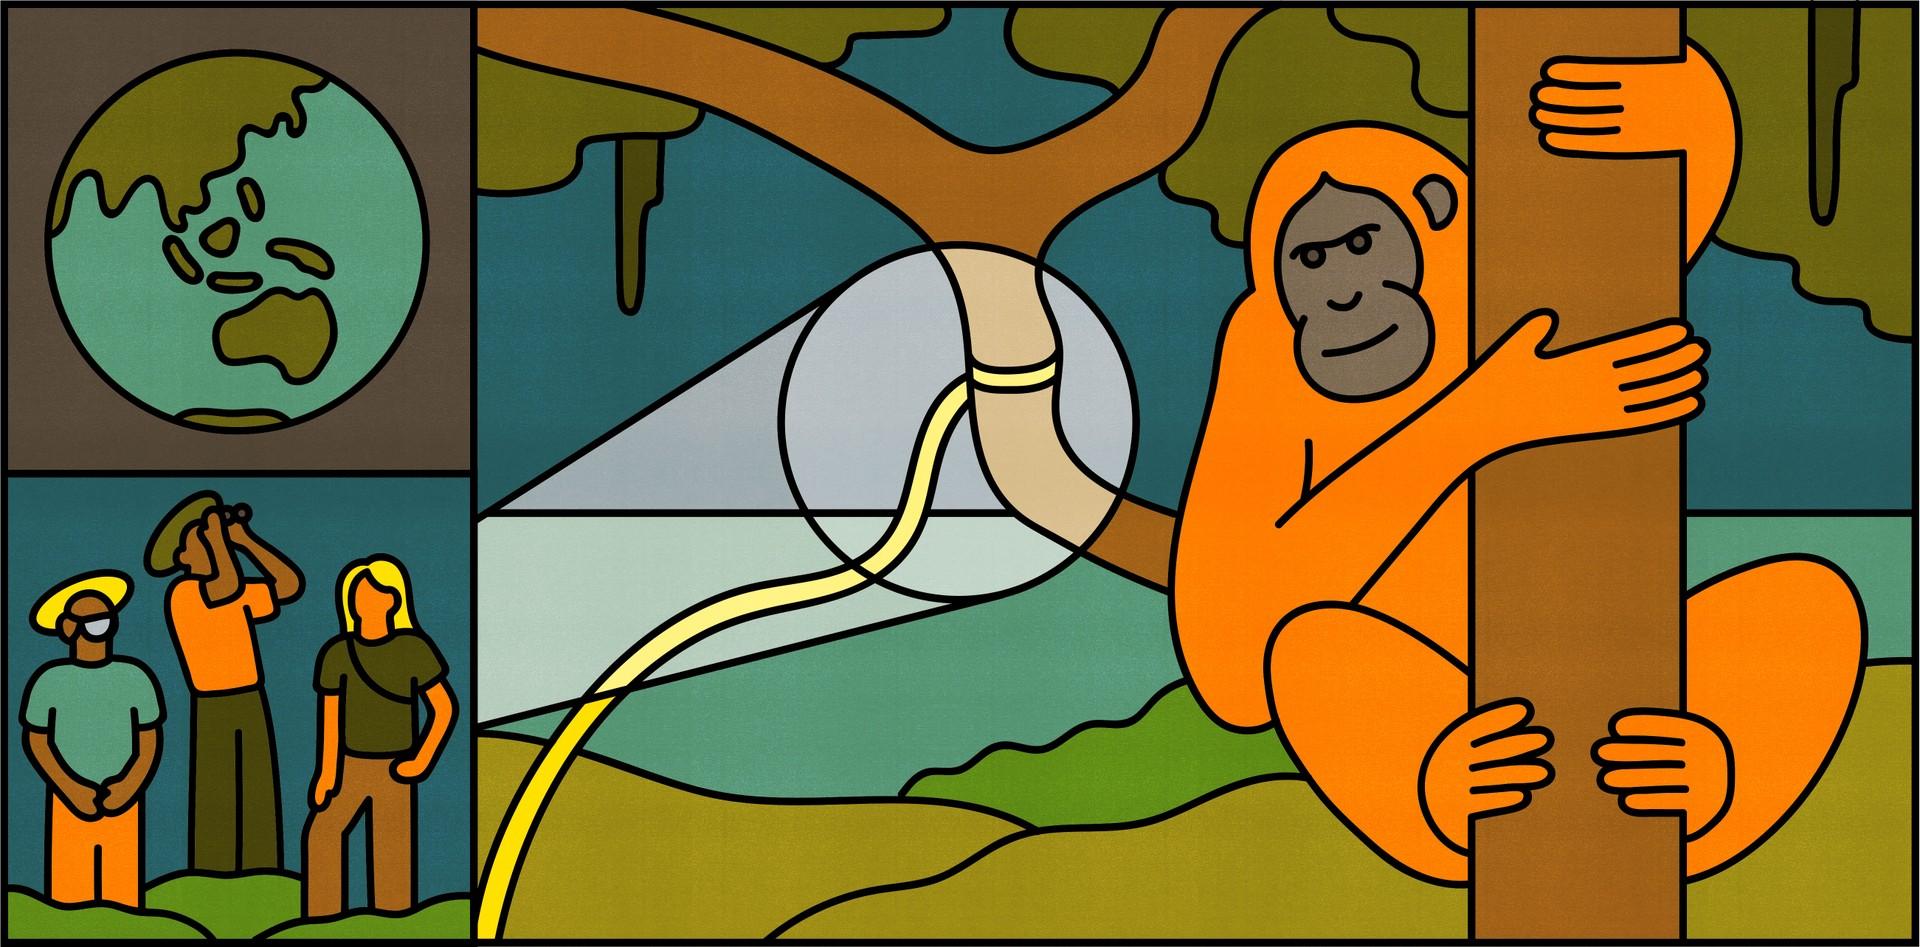 A globe, three researchers, and an orangutan